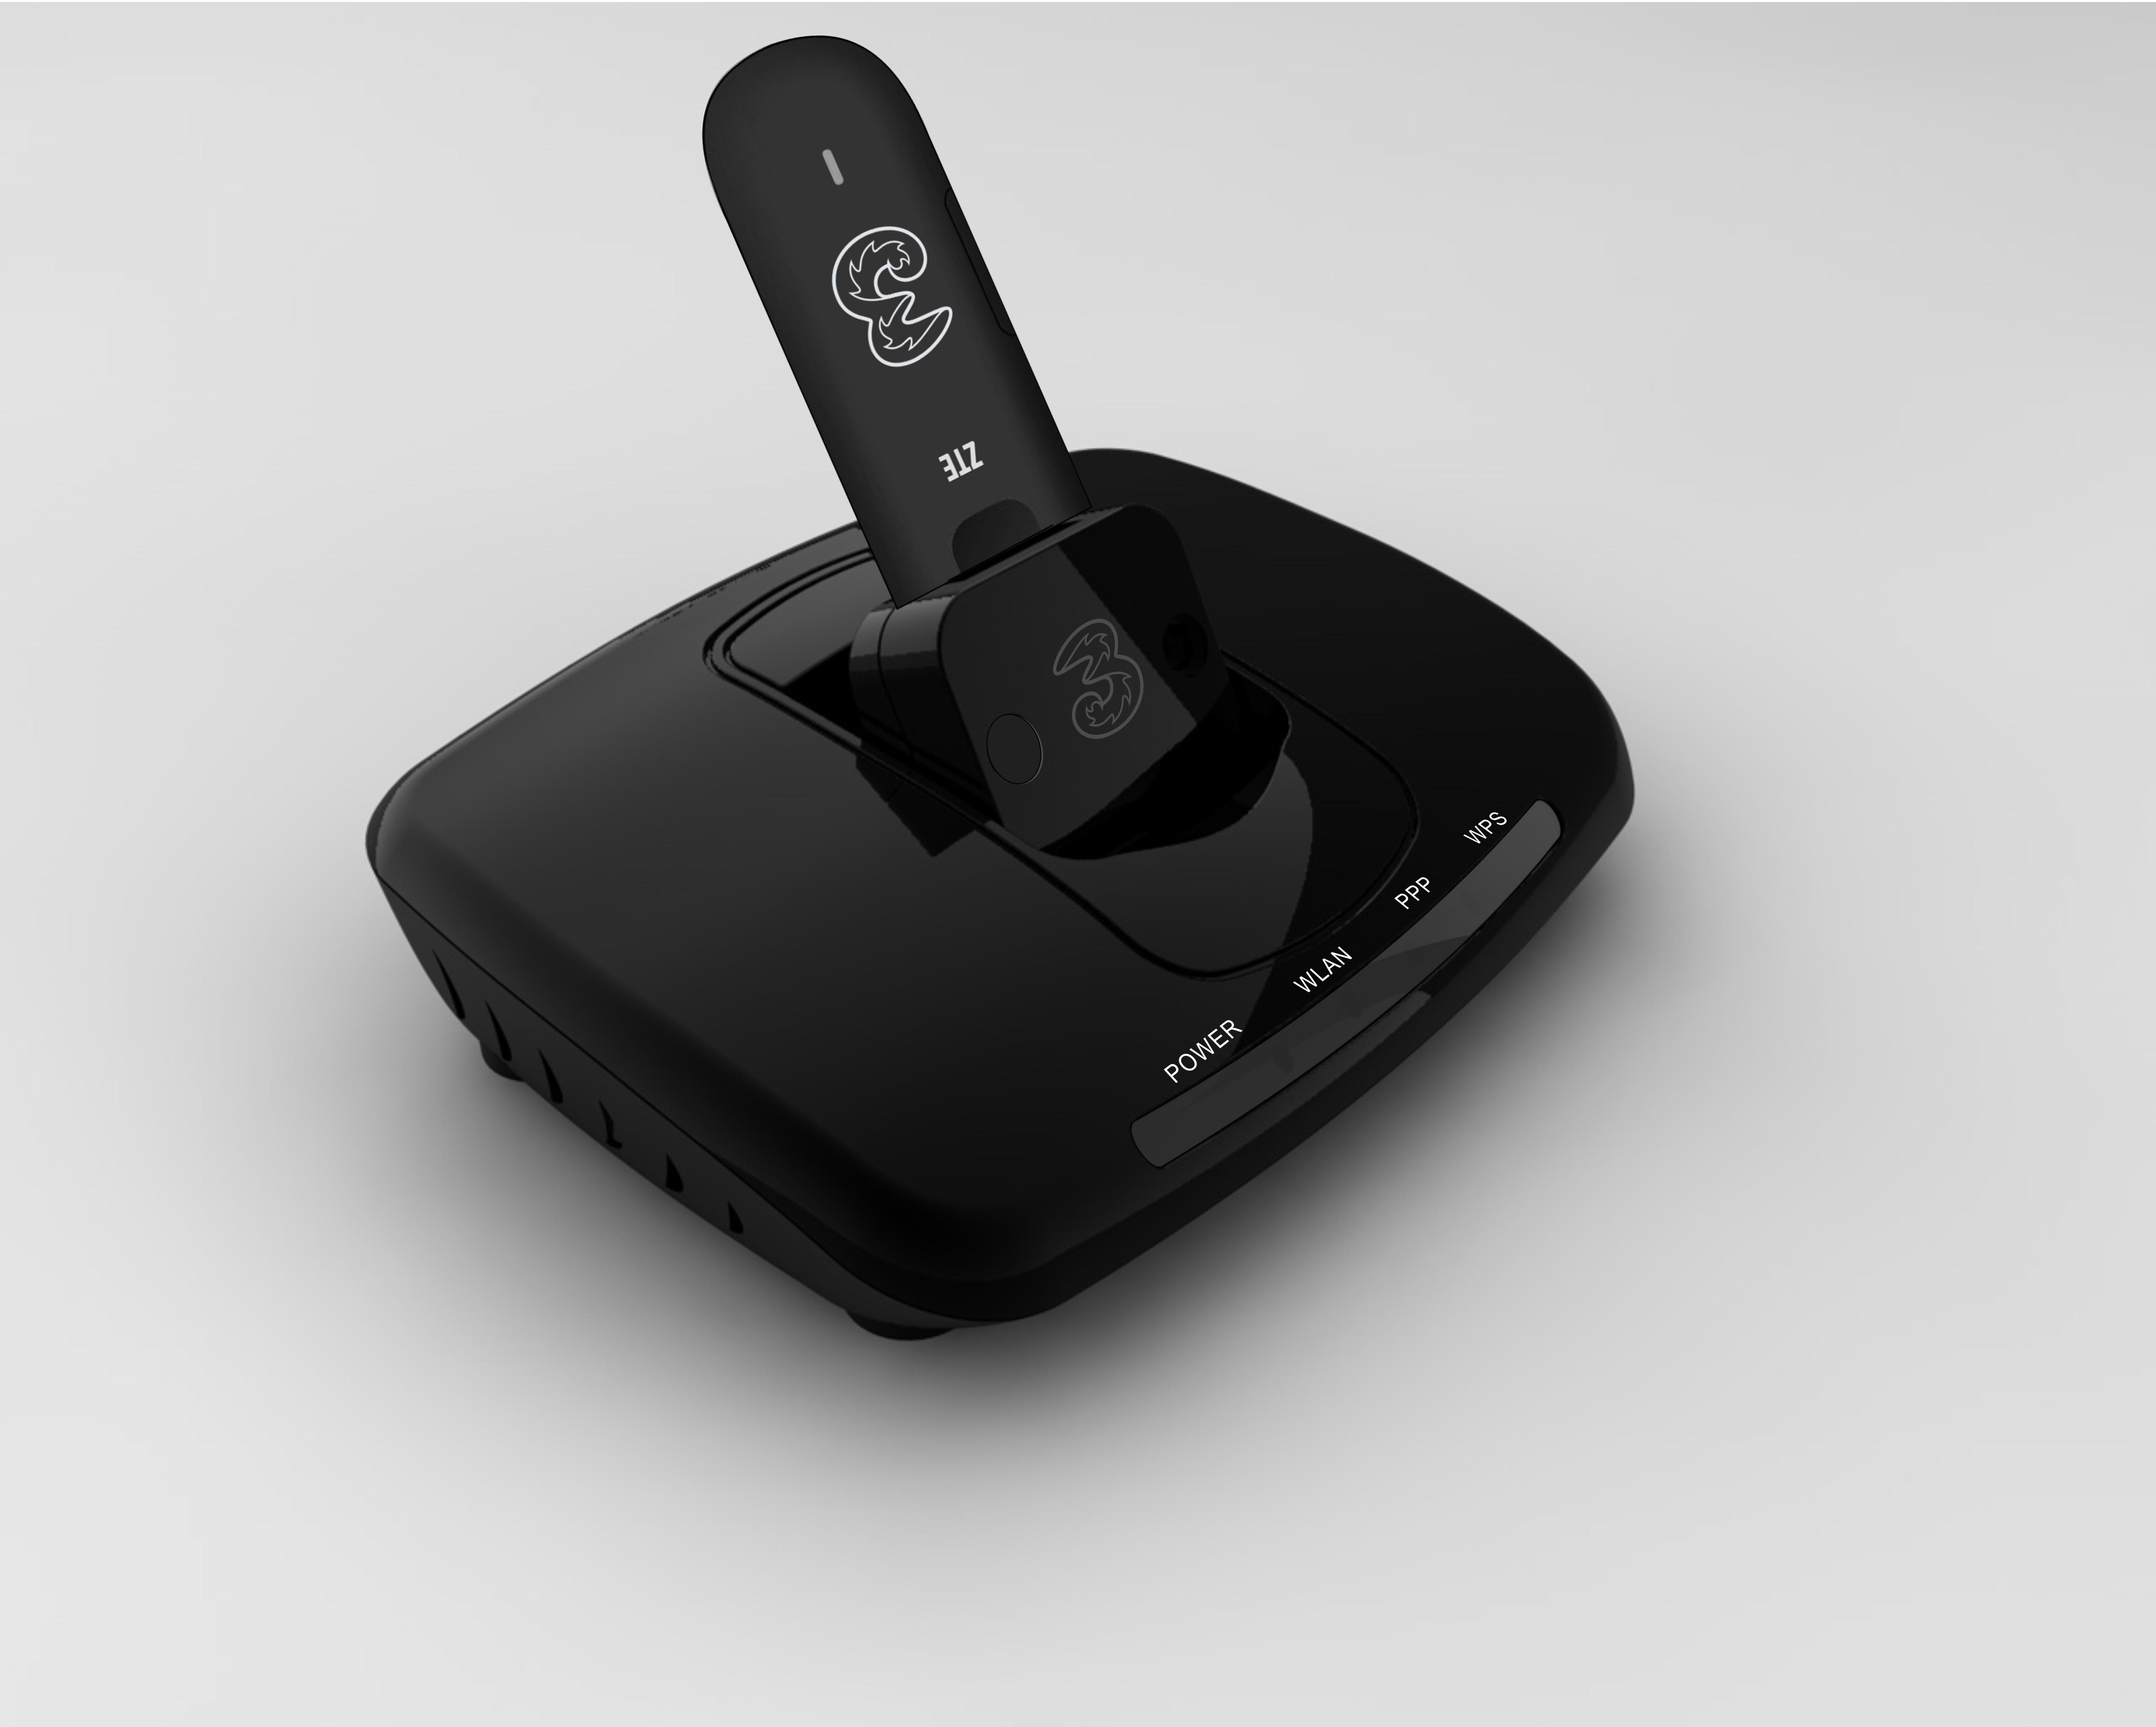 broabdna wifi dongle adaptor